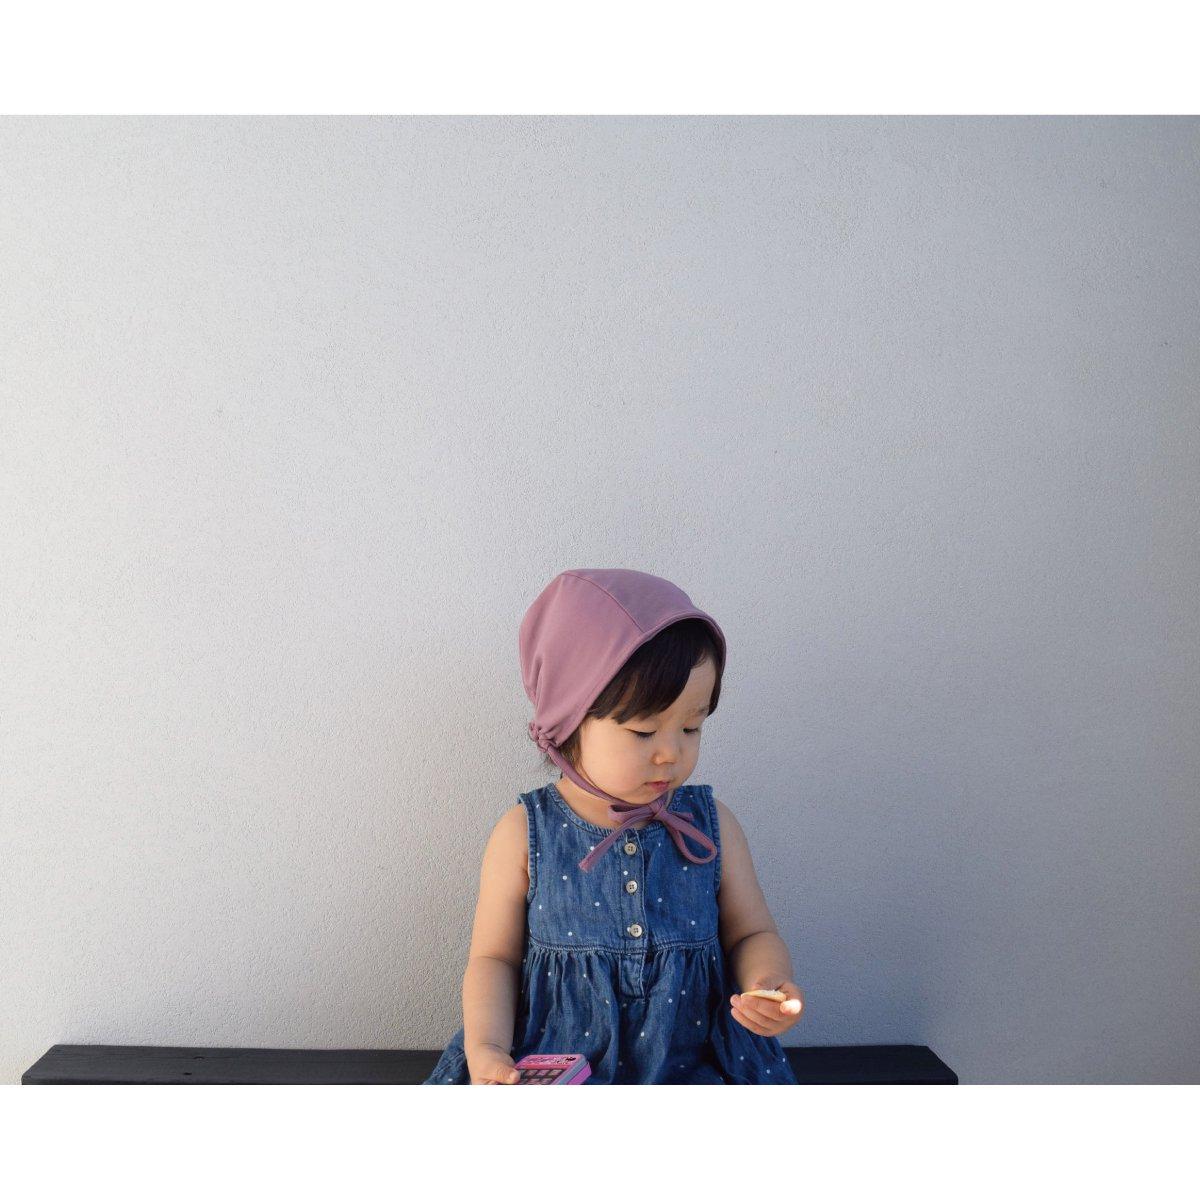 【BABY】Candy Bonnet 詳細画像18